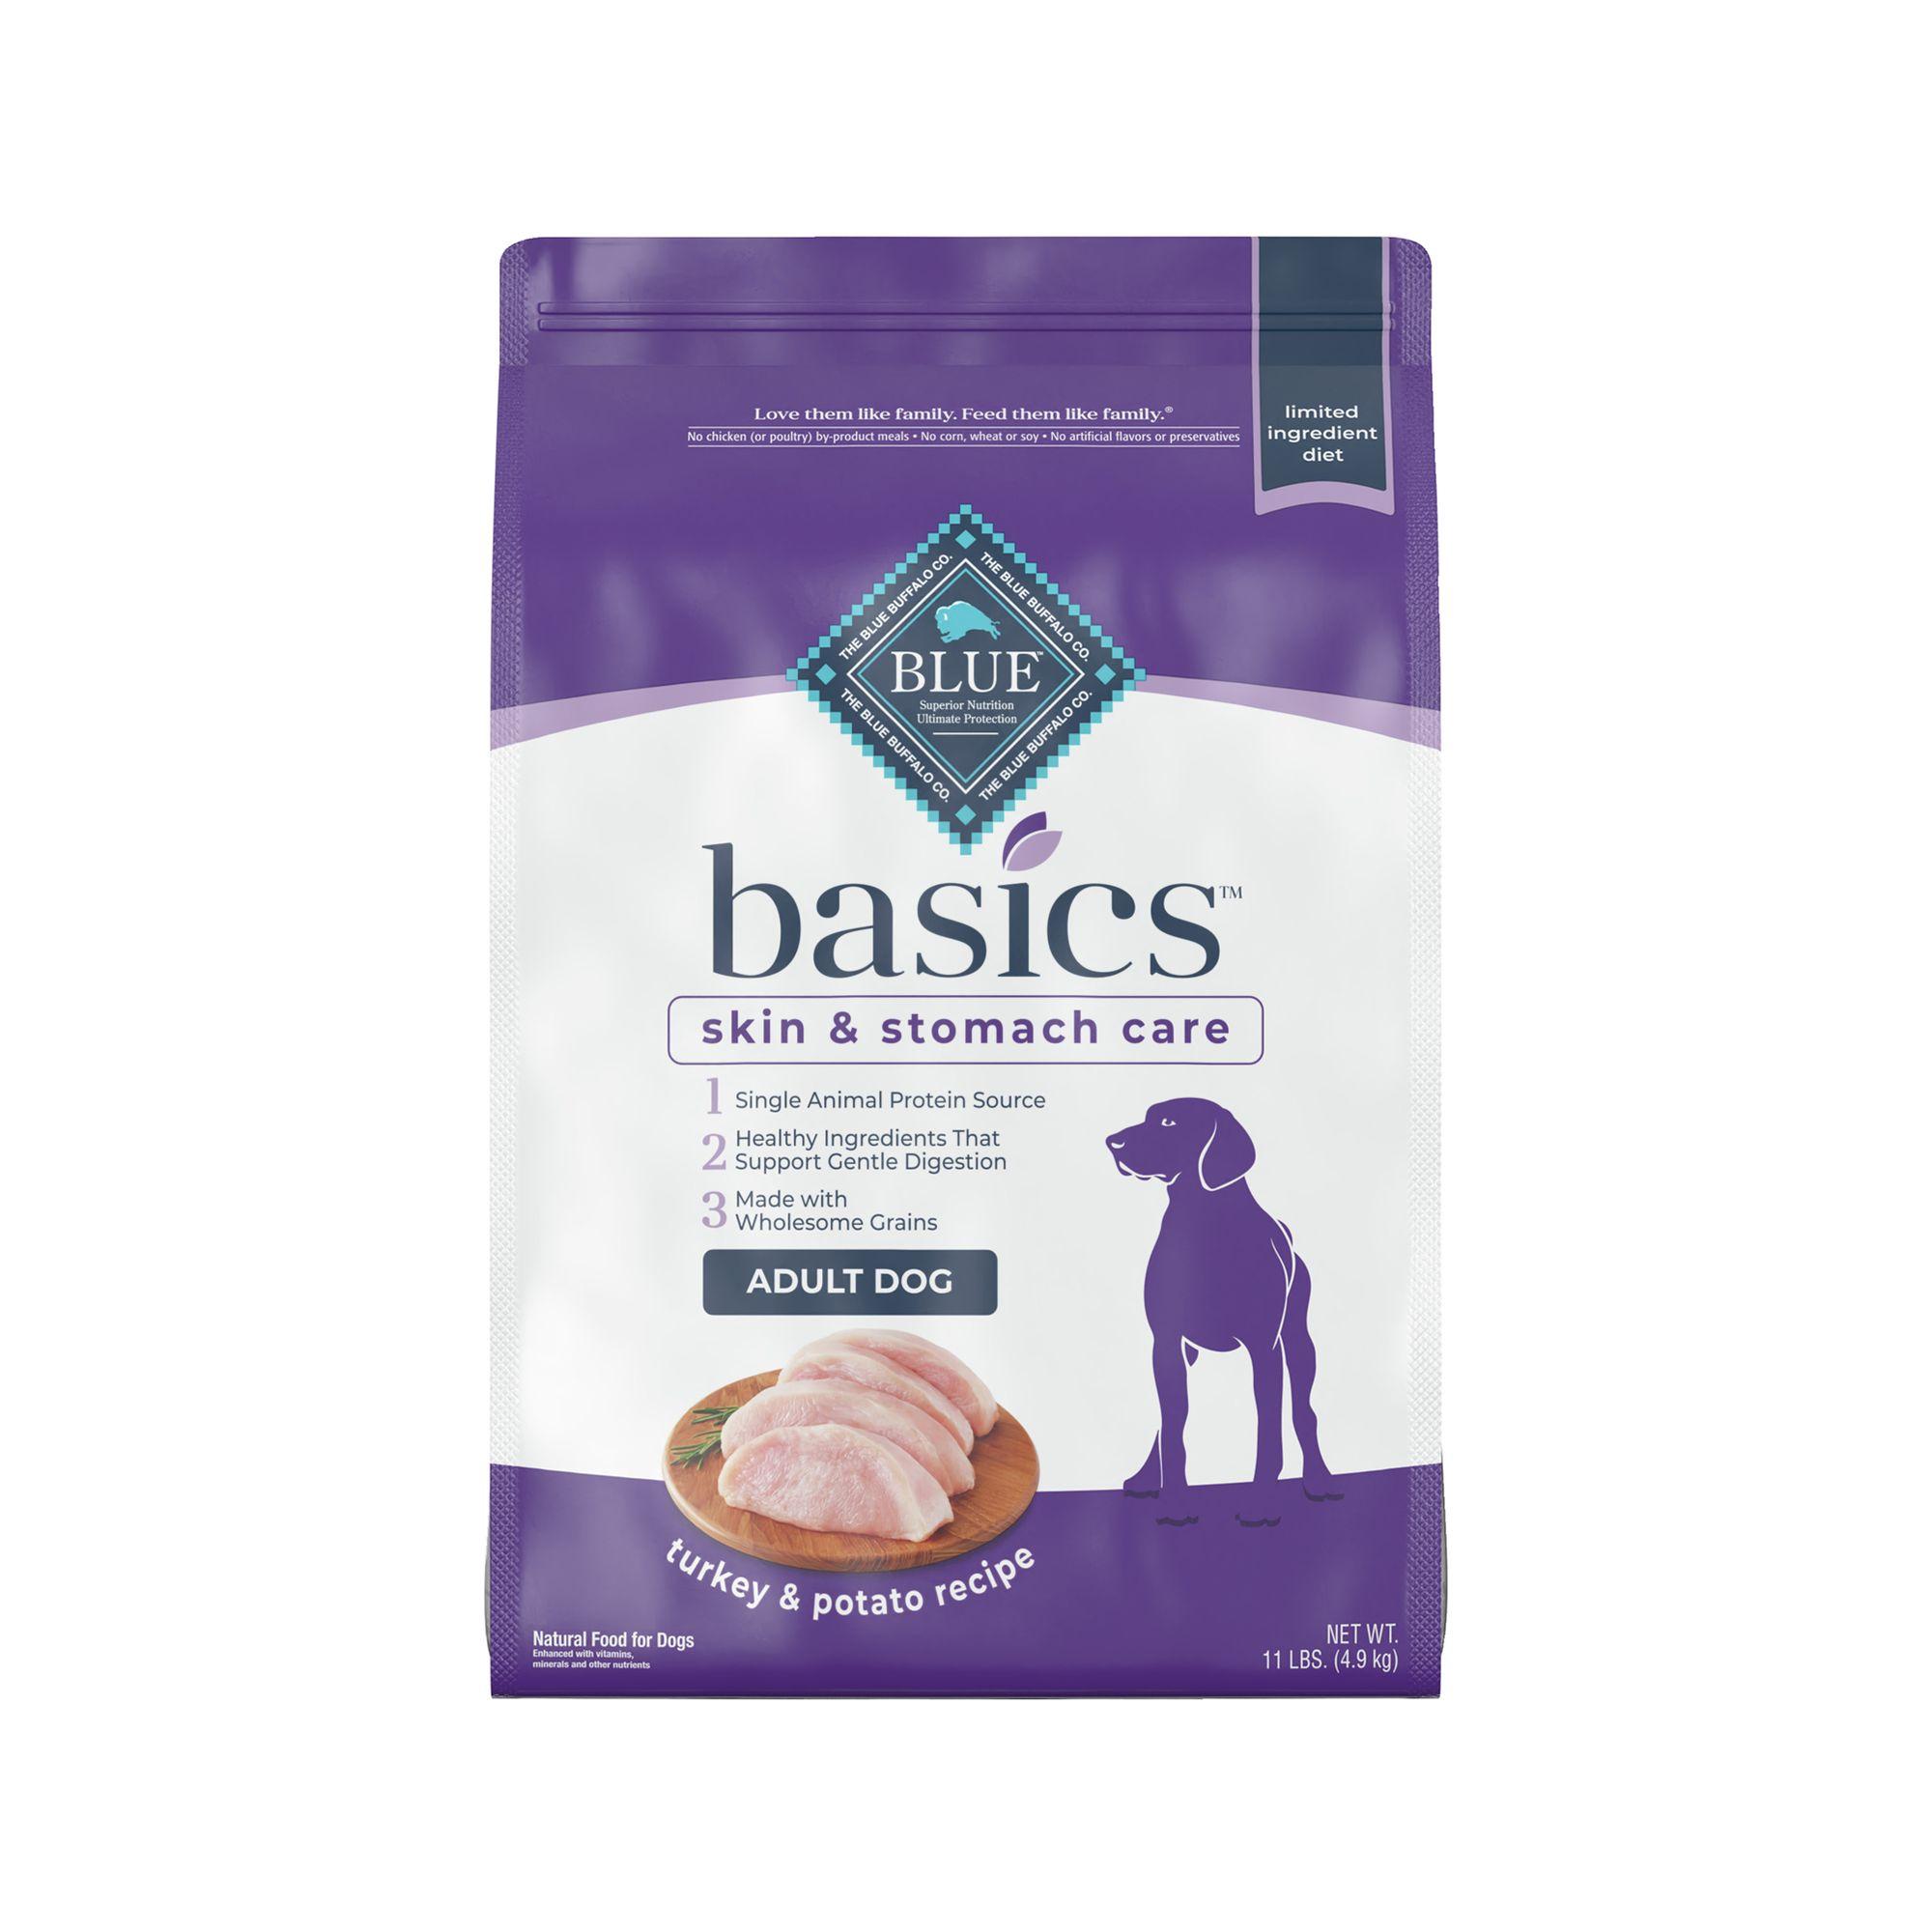 Blue Basics Limited Ingredient Adult Dog Food Size 11 Lb Blue Buffalo